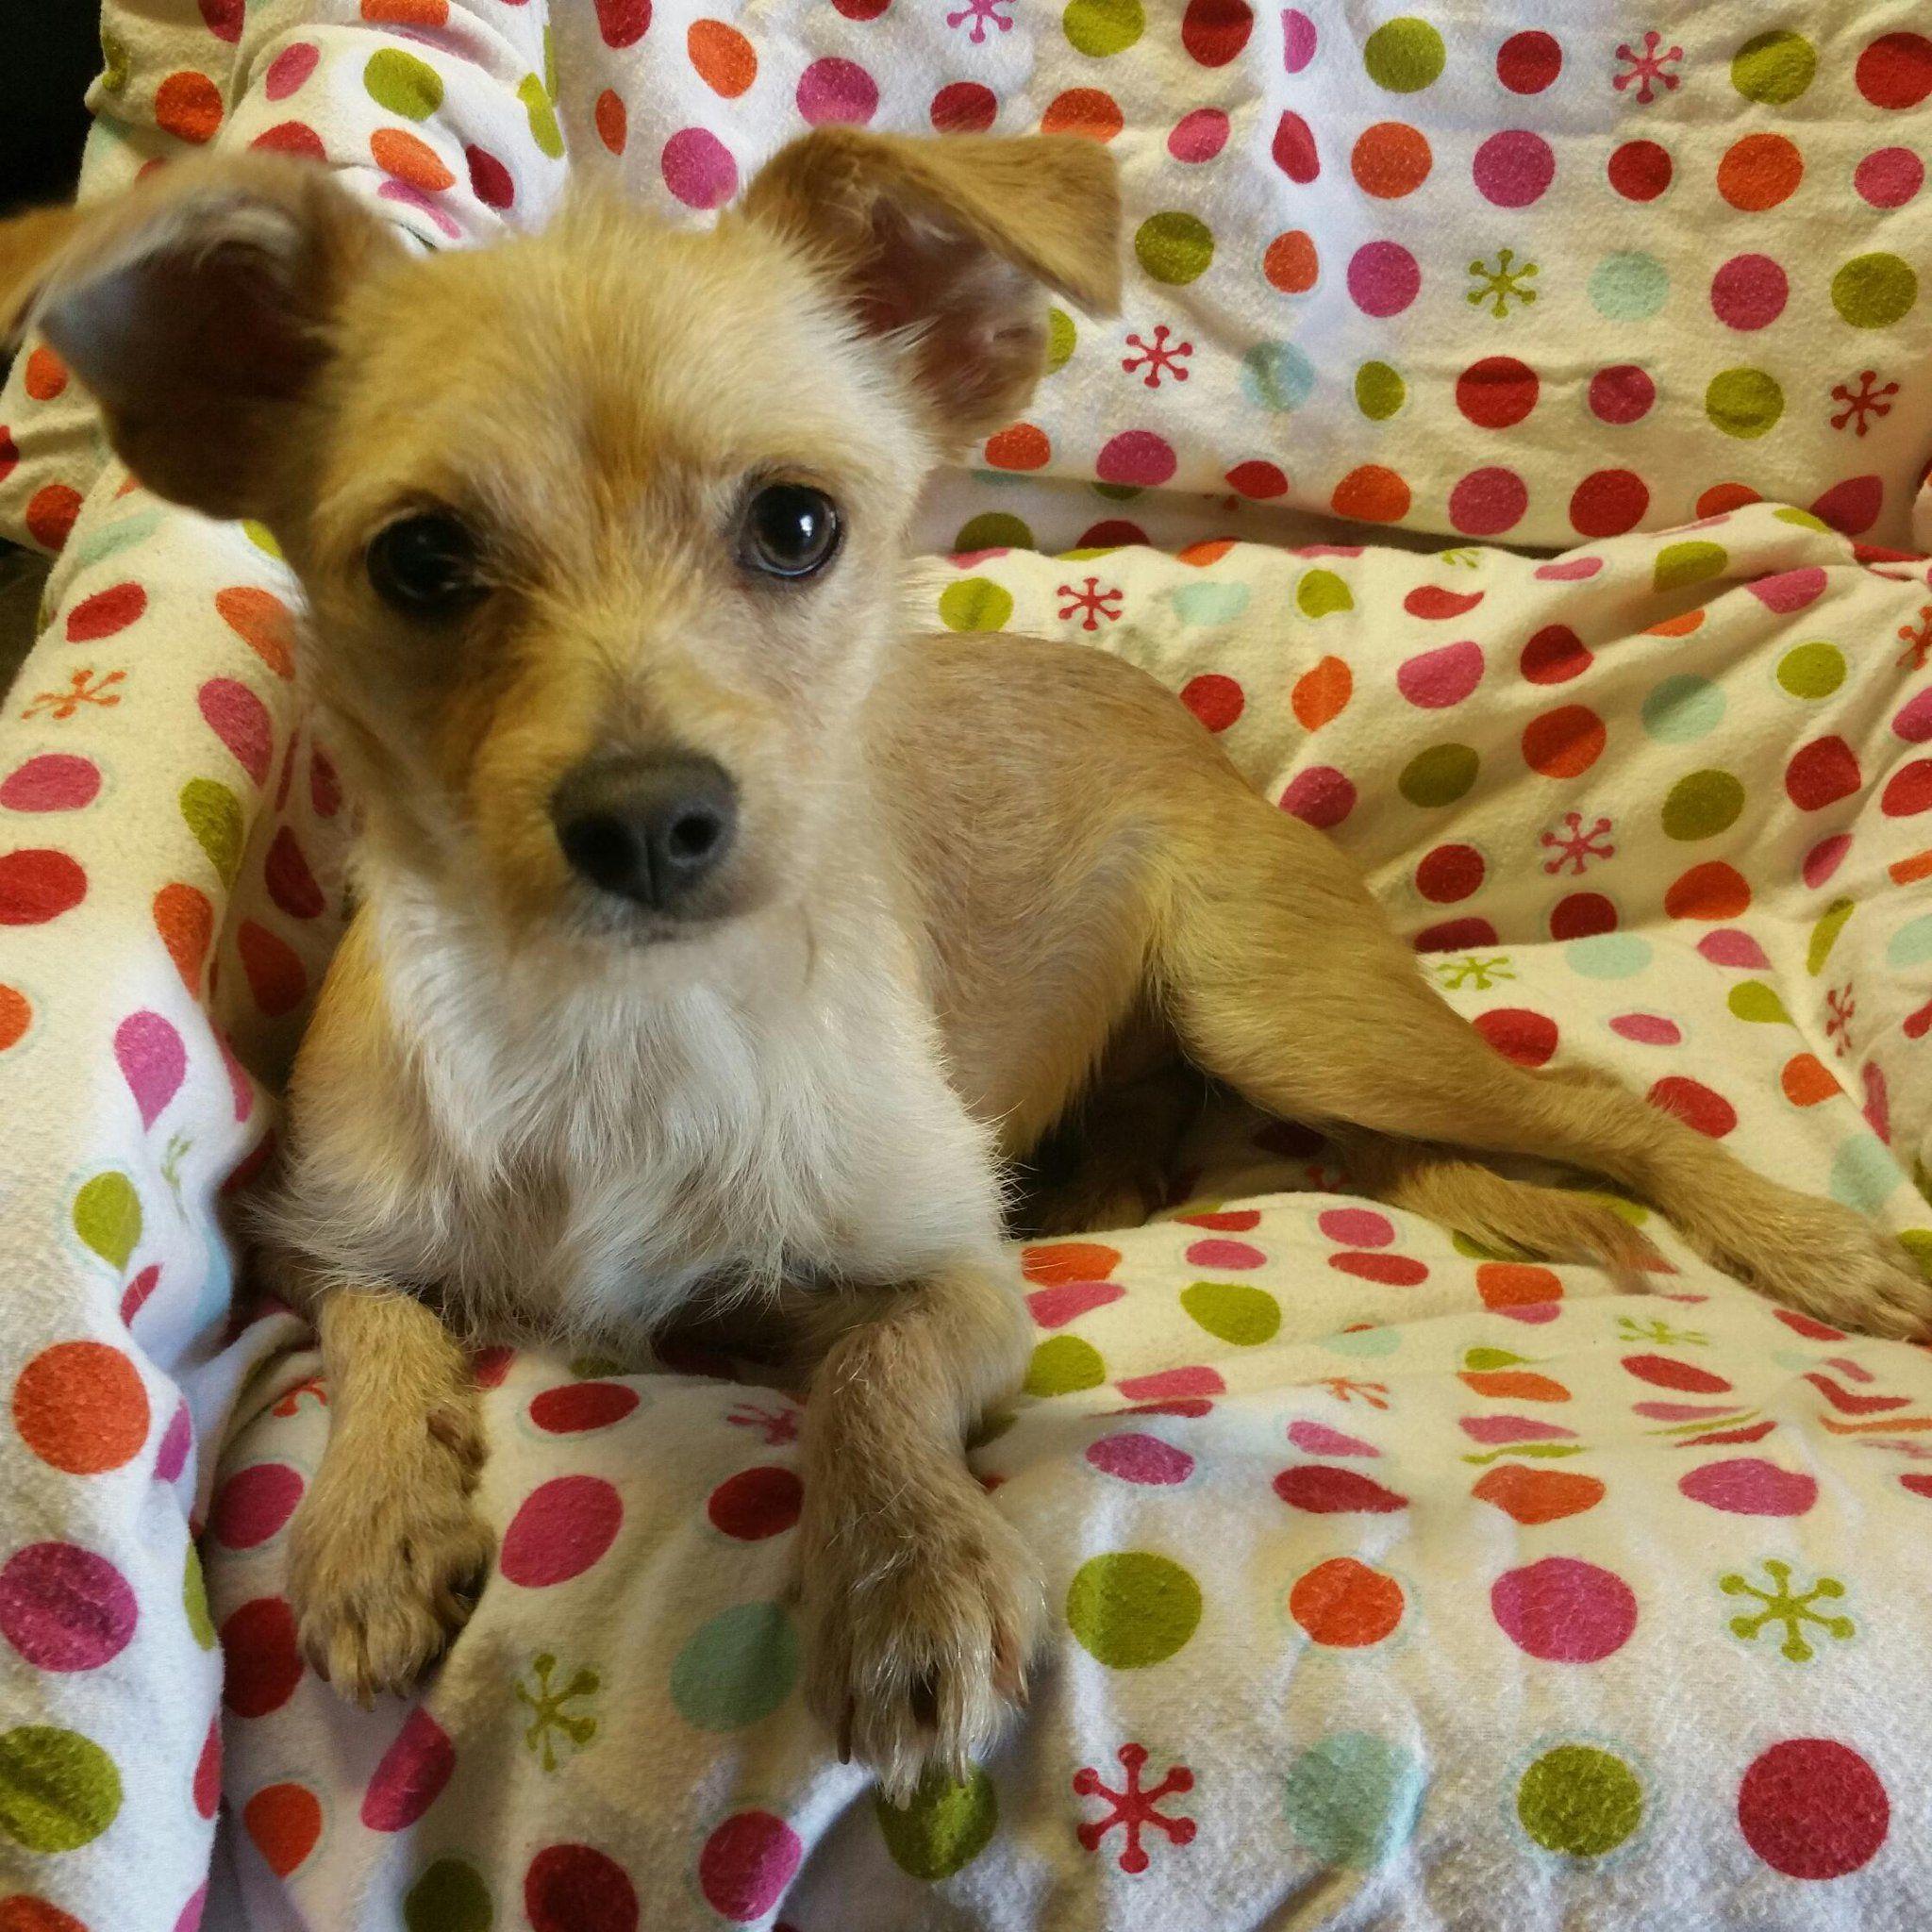 Gayweho Dogs 4 U On Pets Pet Adoption Dogs